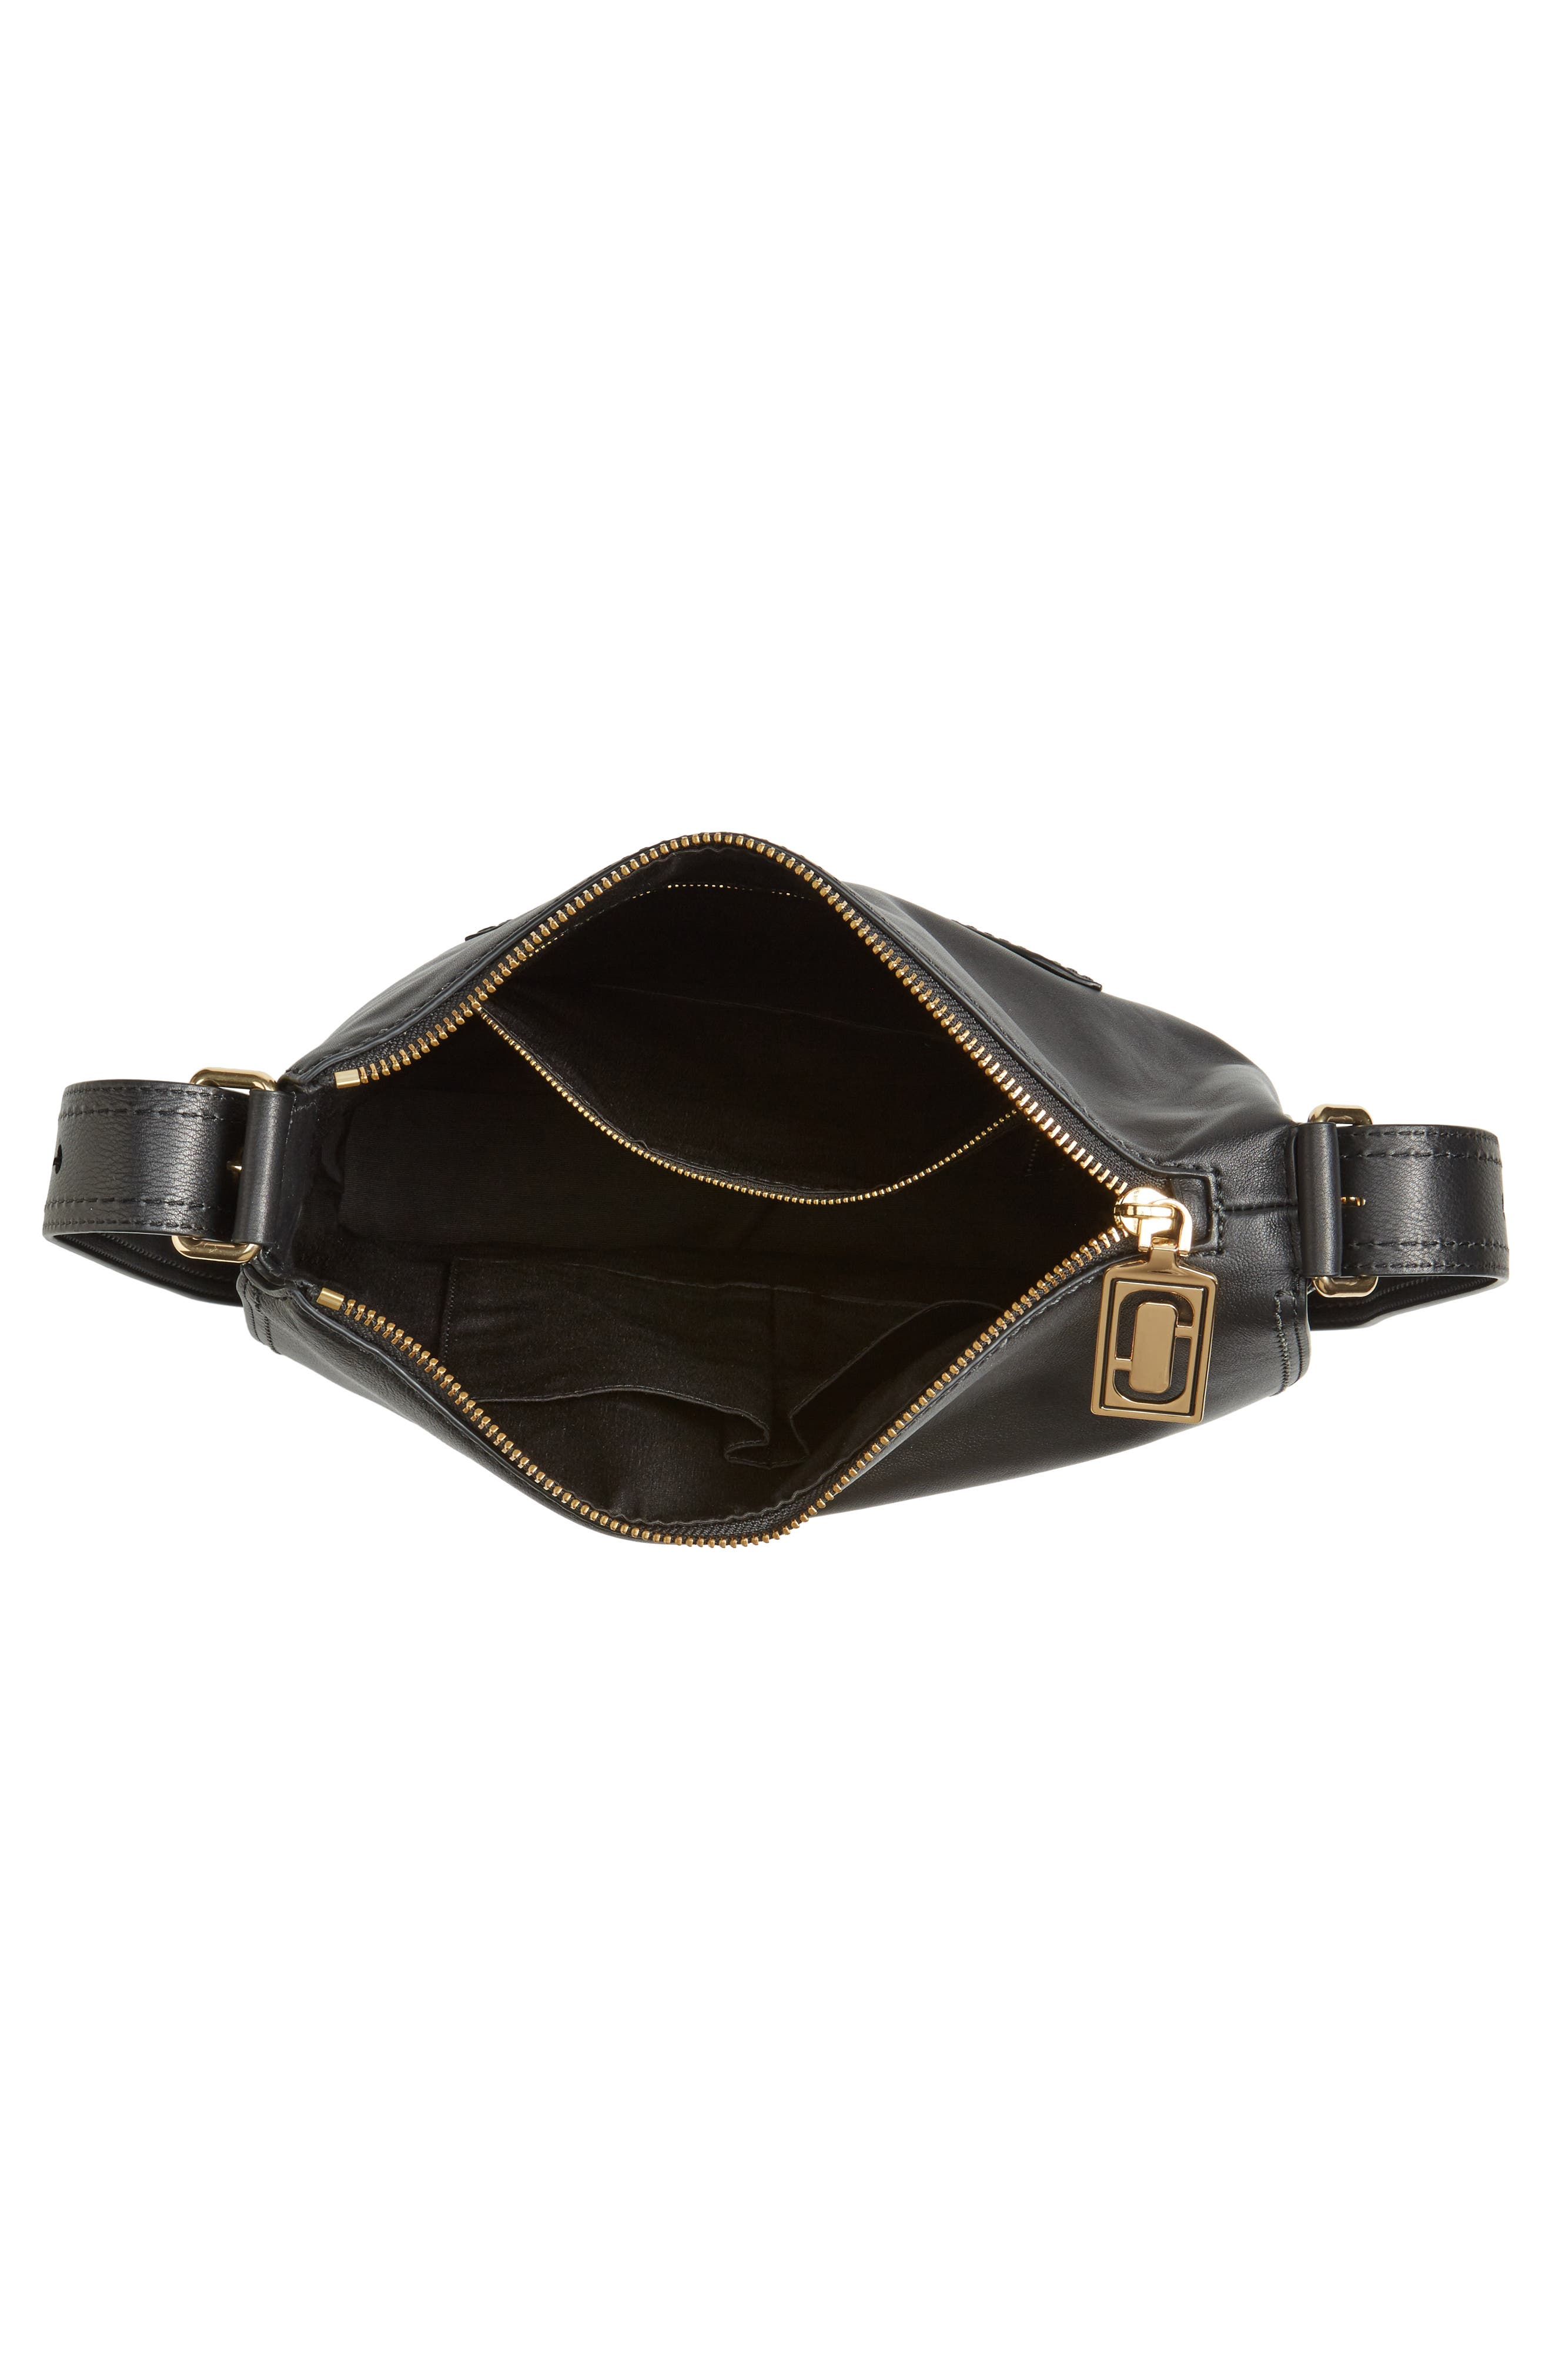 Downtown Stud Leather Shoulder Bag,                             Alternate thumbnail 3, color,                             Black